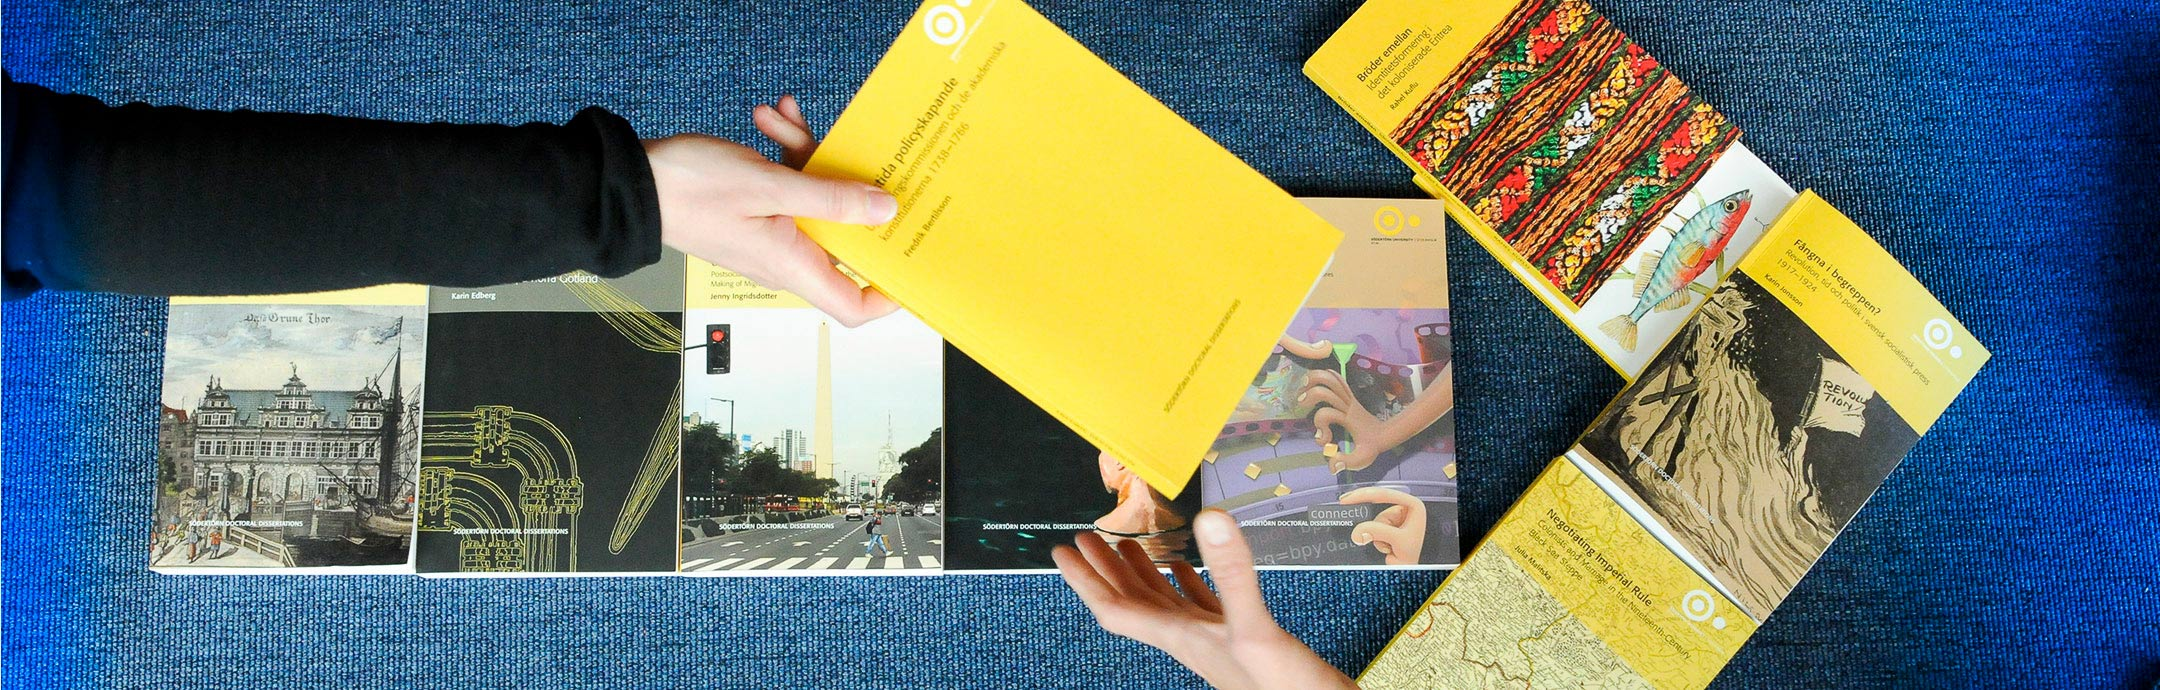 Is homework helpful or harmful argument essay rubric common